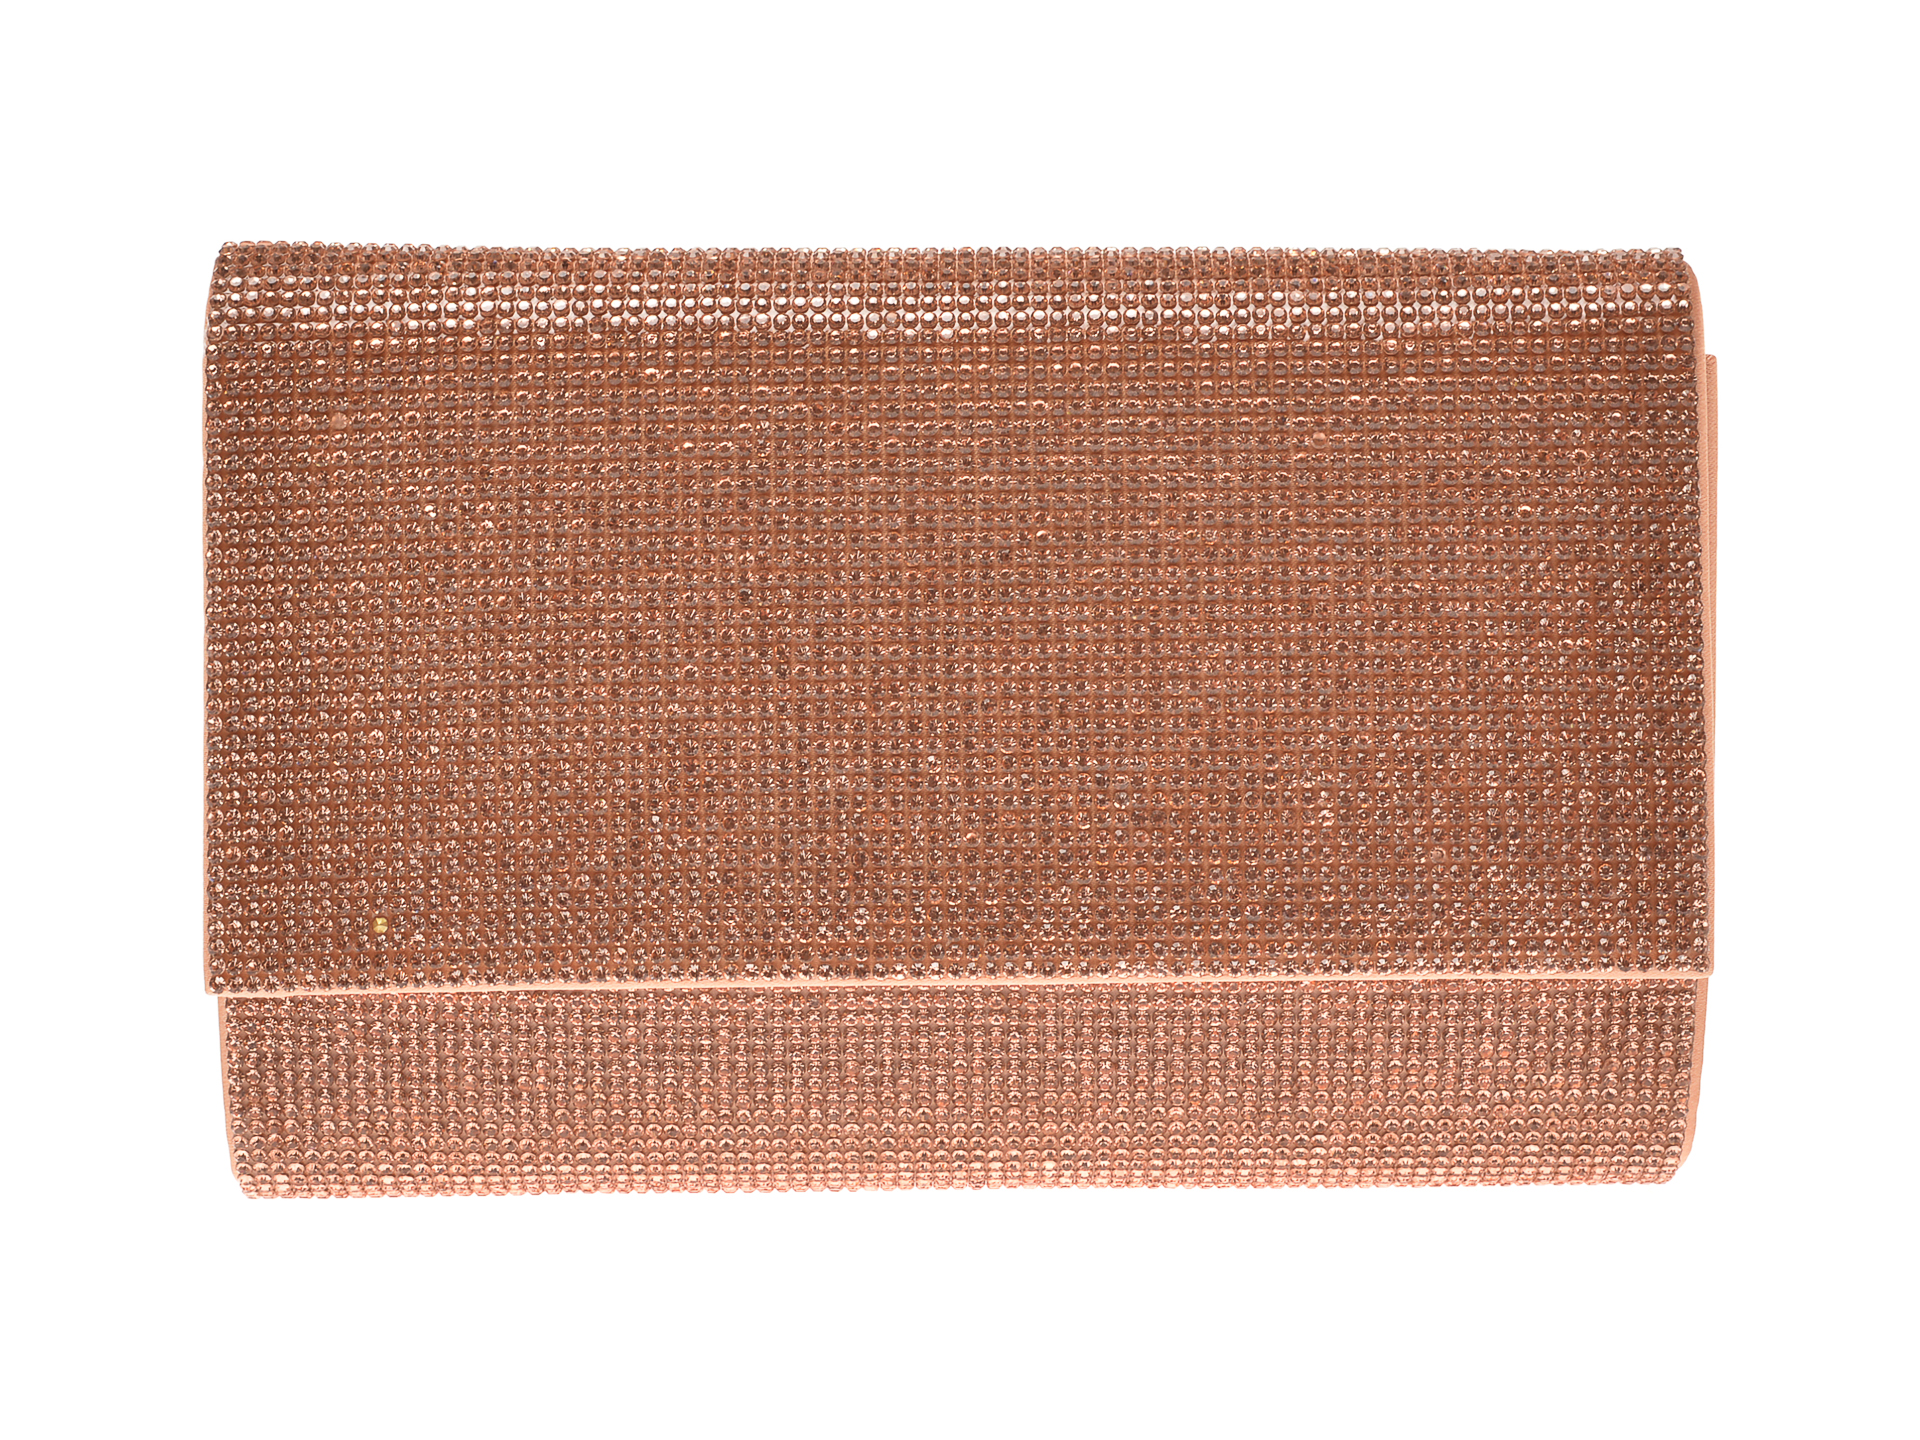 Poseta plic ALDO aurie, Imnaha650, din material textil imagine